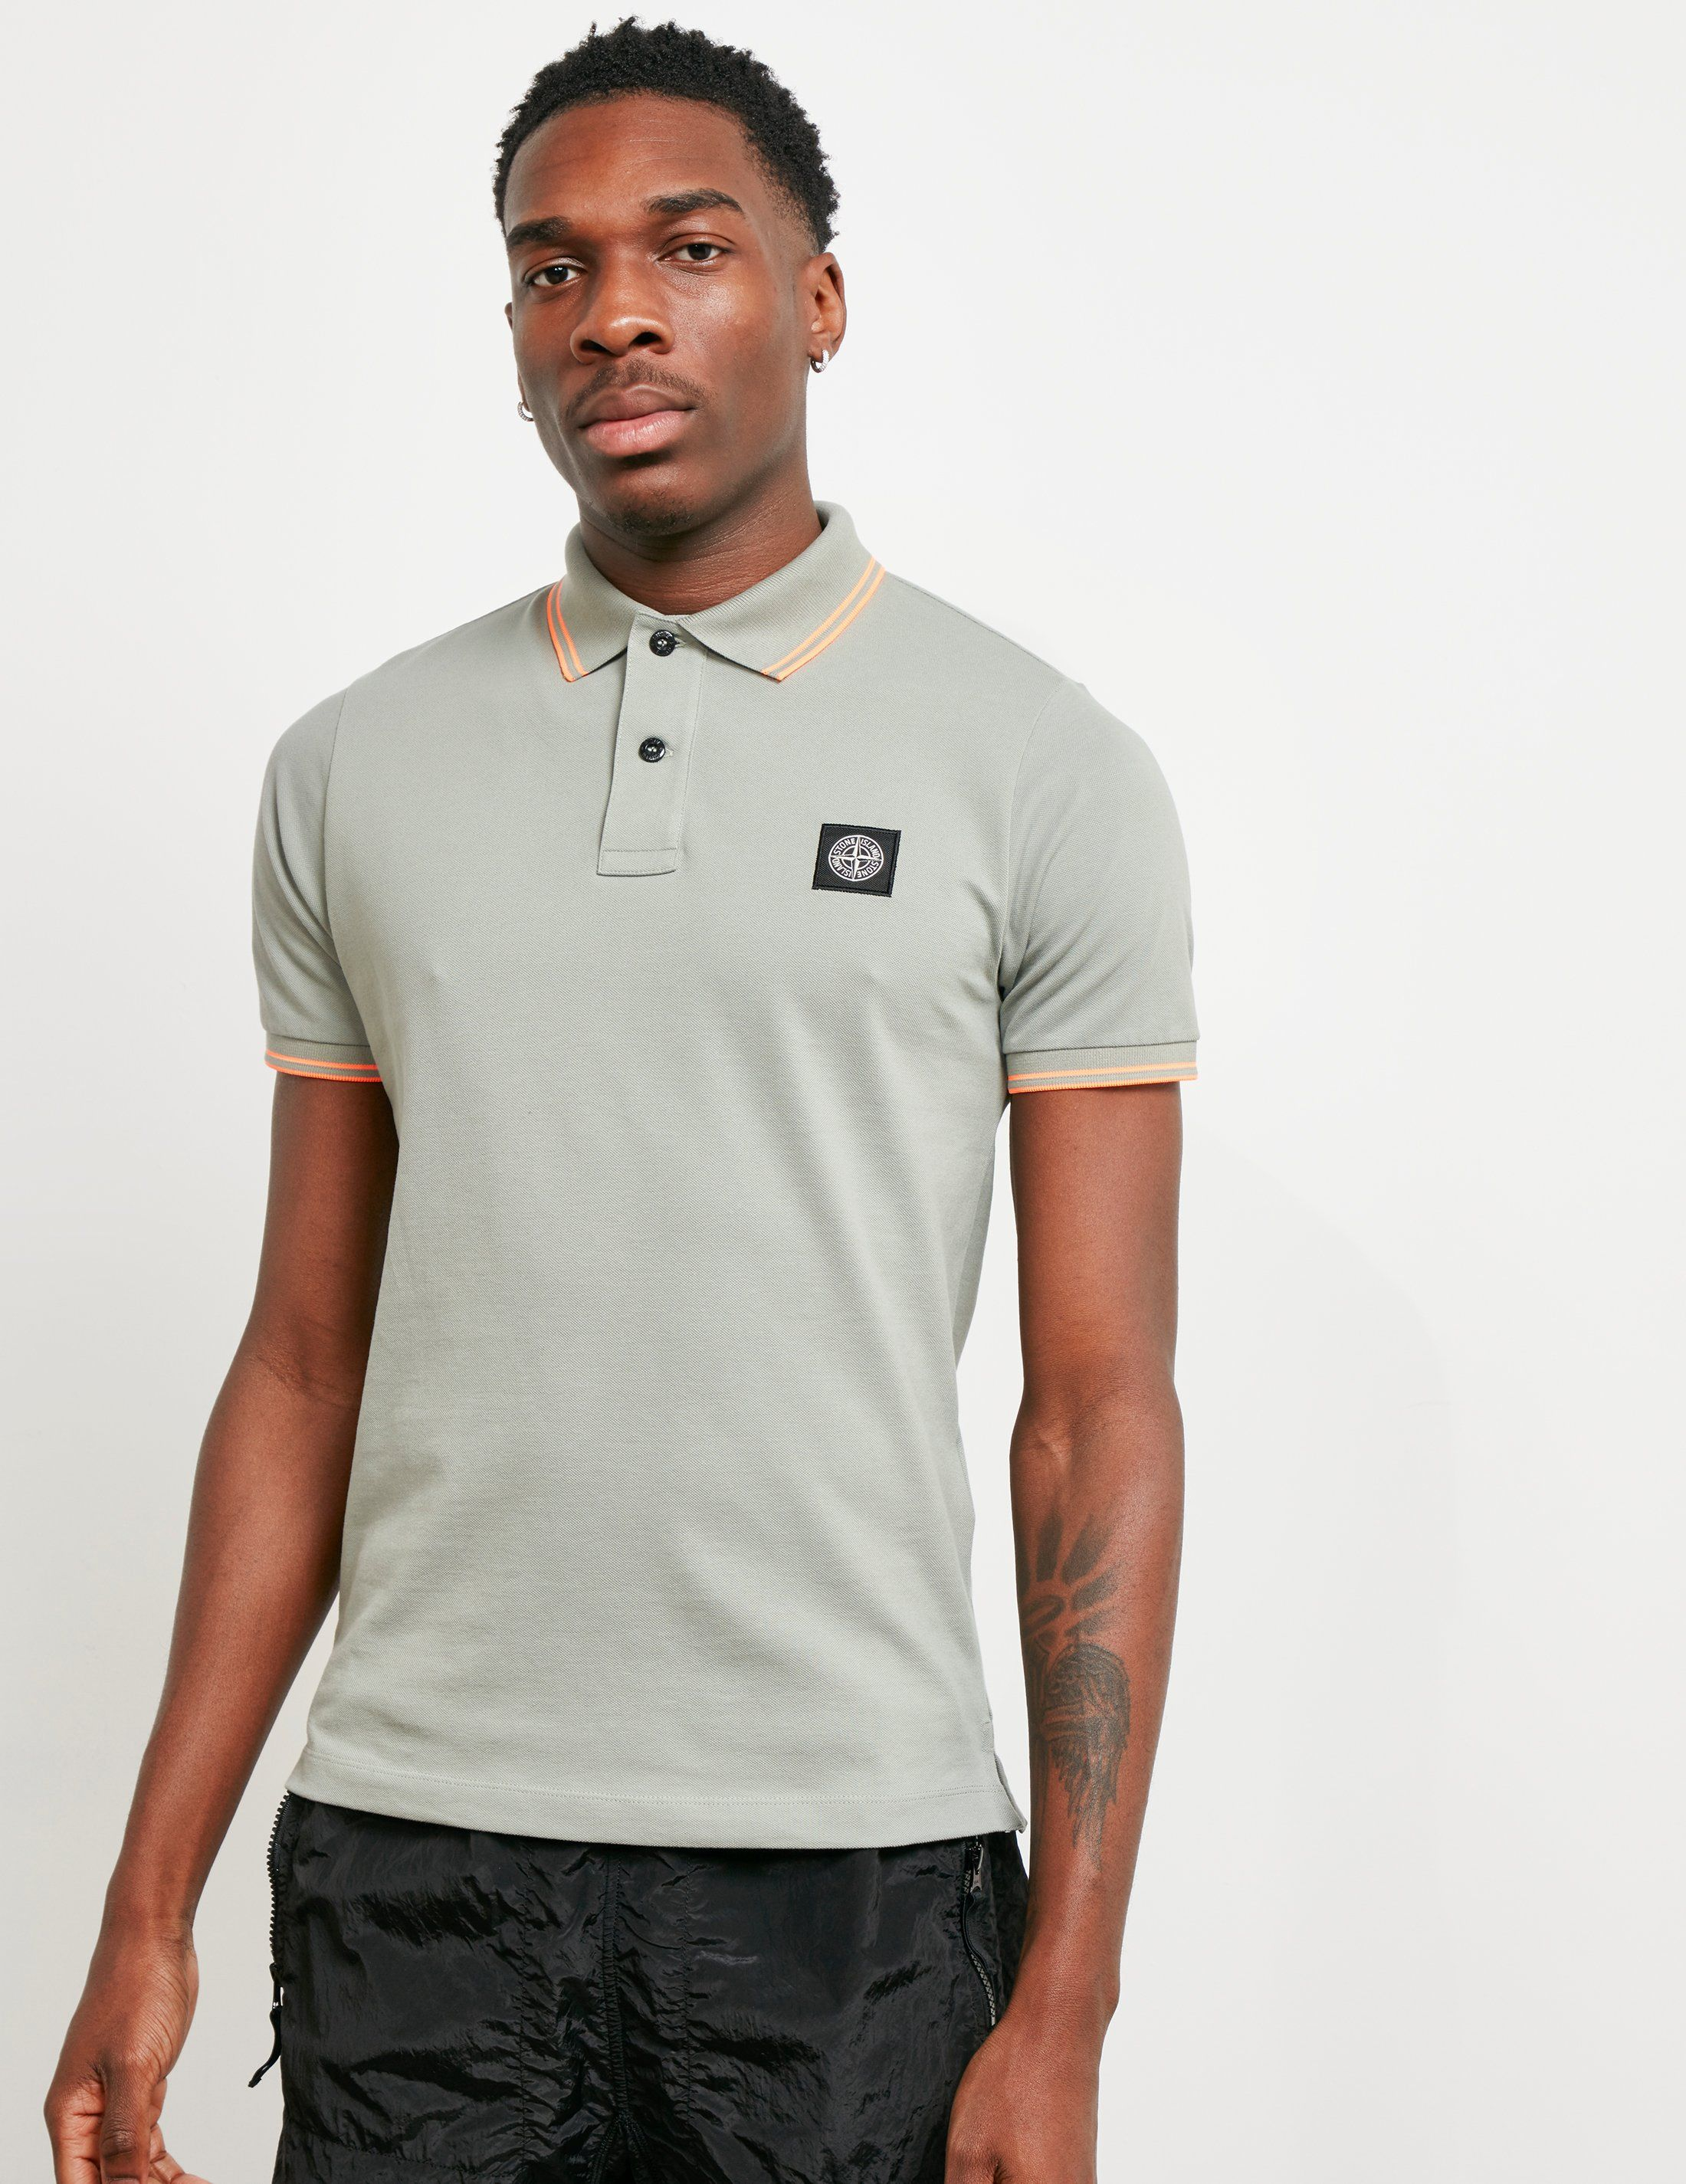 Stone Island Fluorescent Tipped Short Sleeve Polo Shirt